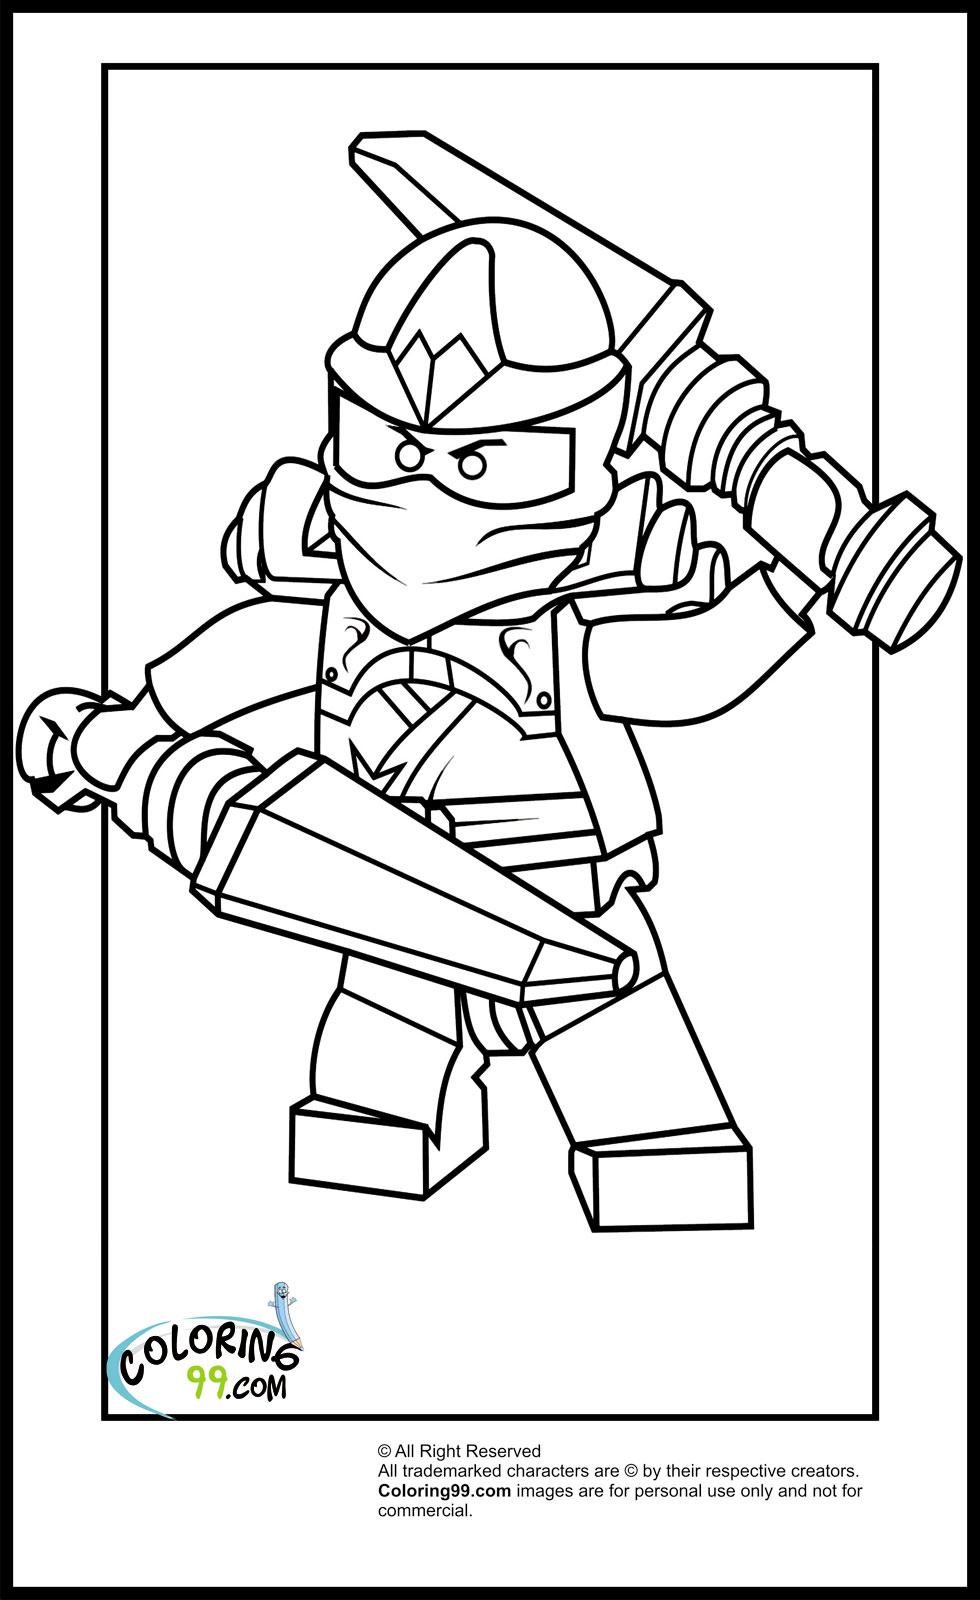 Coloriage ninjago gratuit - dessin a imprimer #7